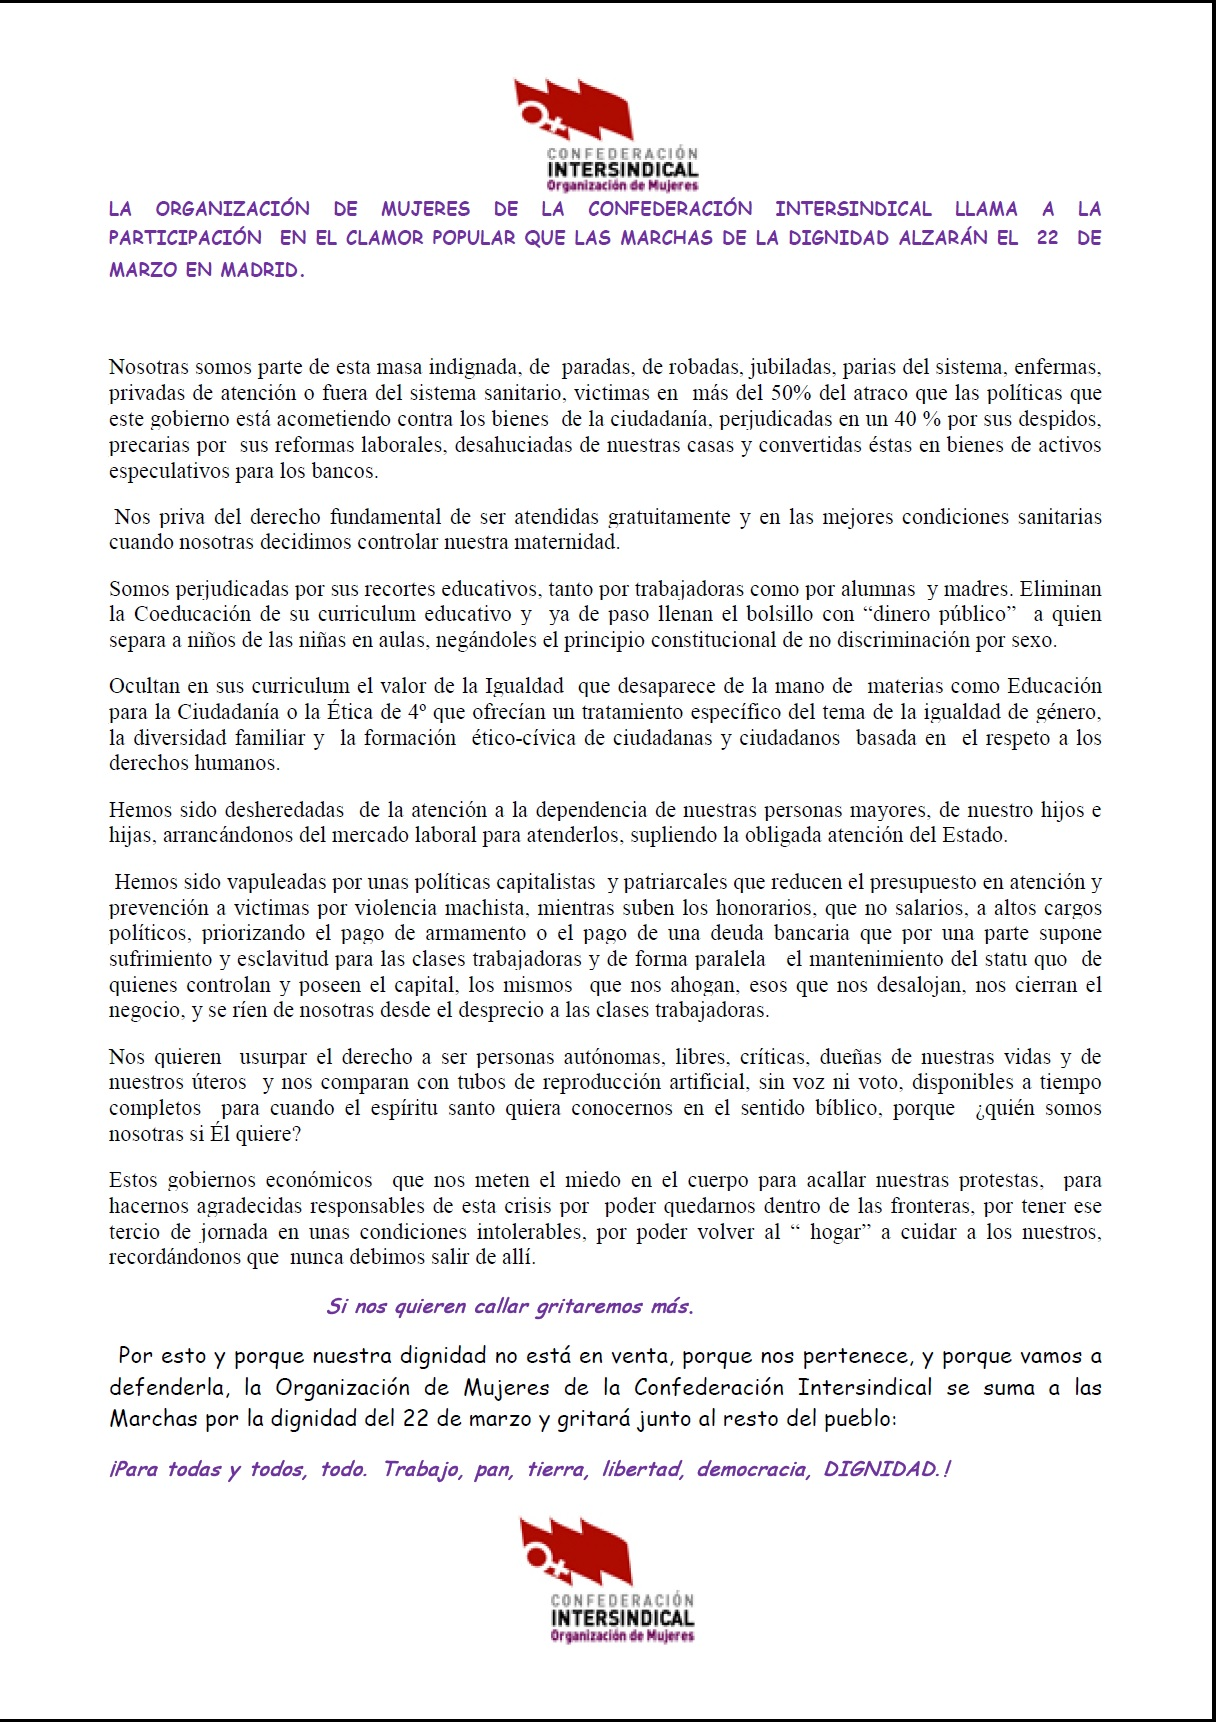 22M2014_comunicadoOMmarchas